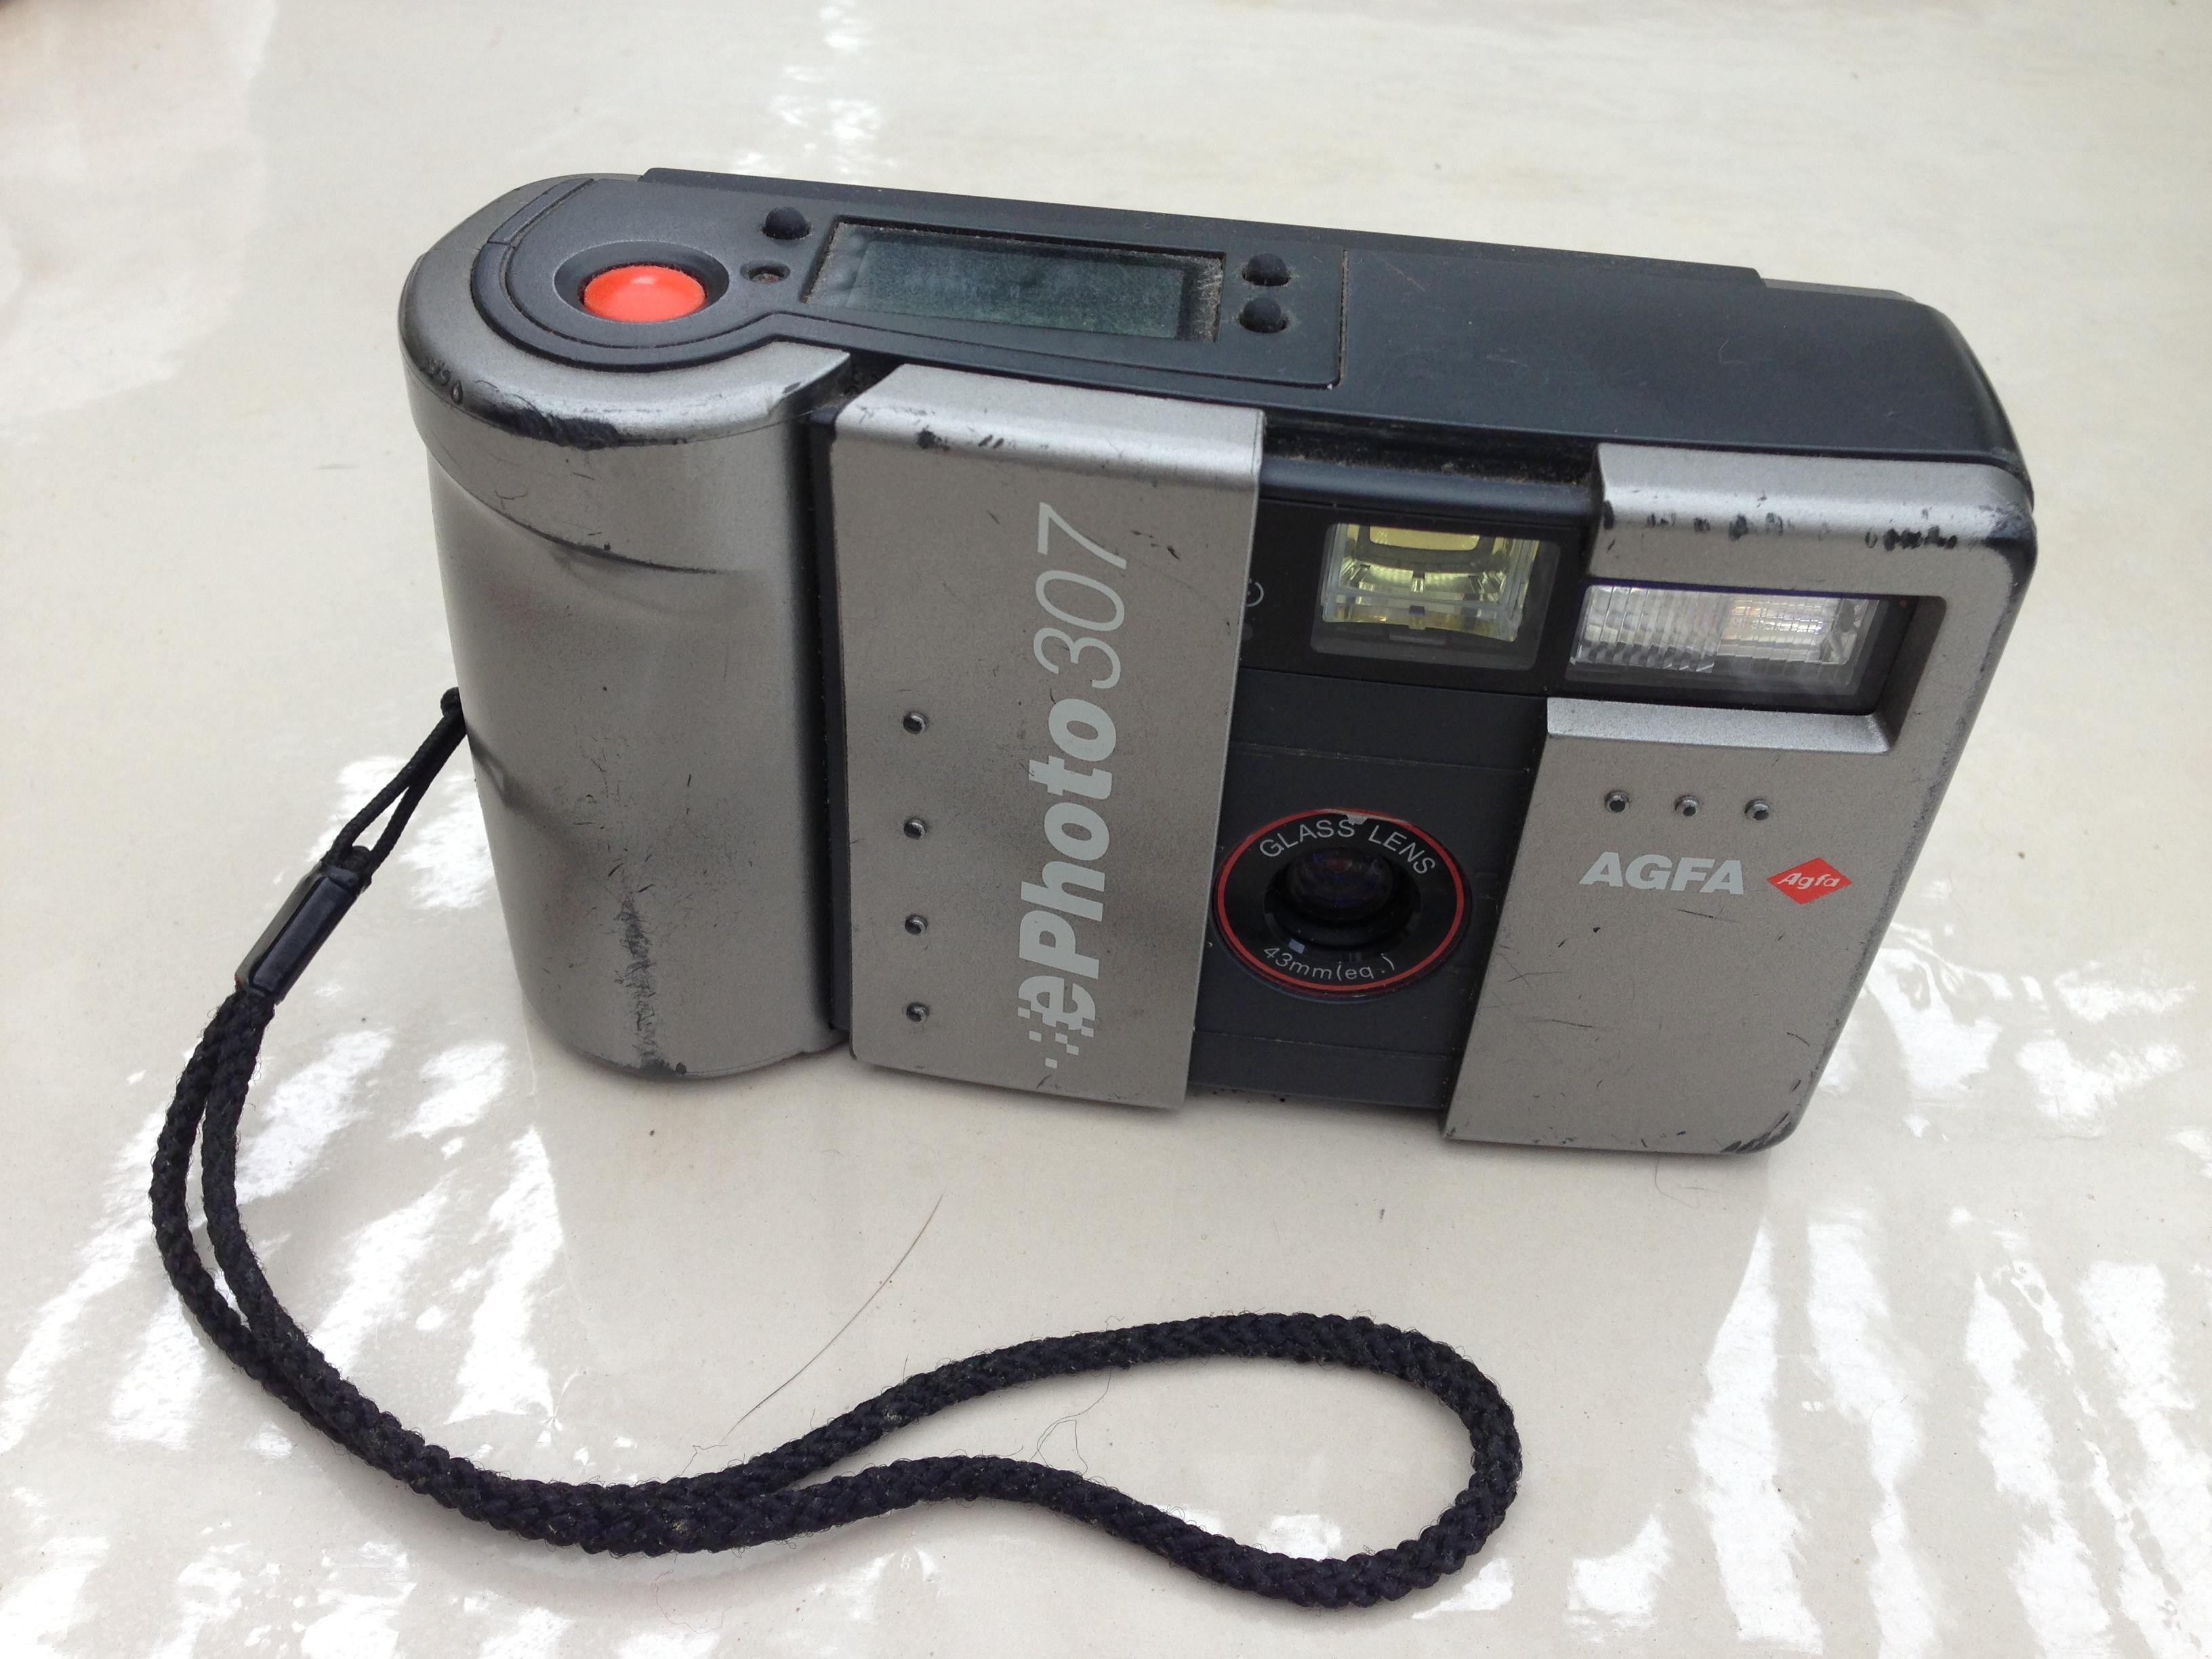 Cached Agfa ephoto 1680 digital camera